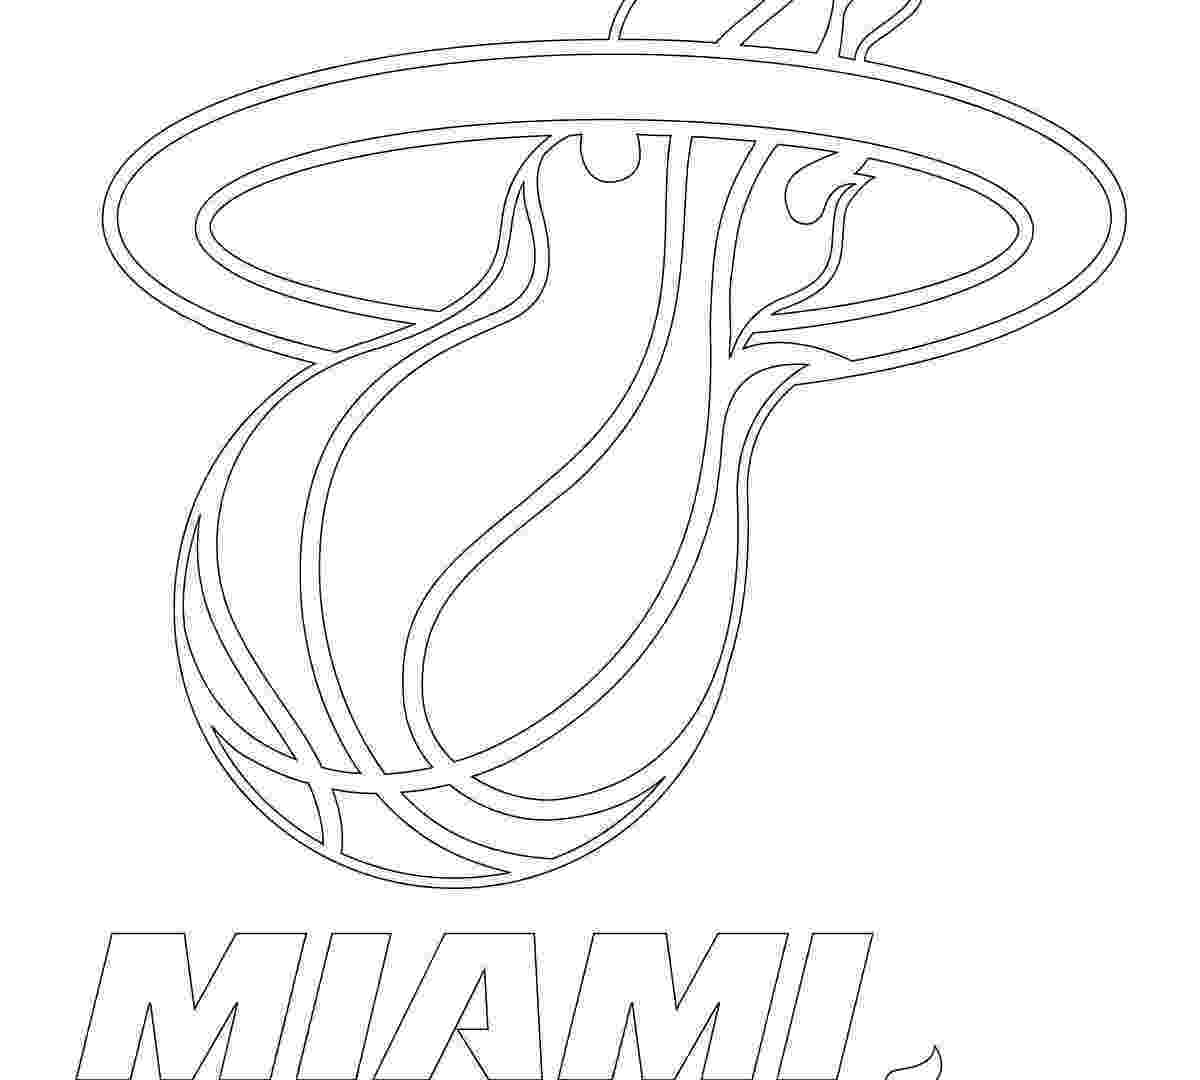 miami heat coloring sheets printable free basketball coloring page of ball miami coloring heat sheets